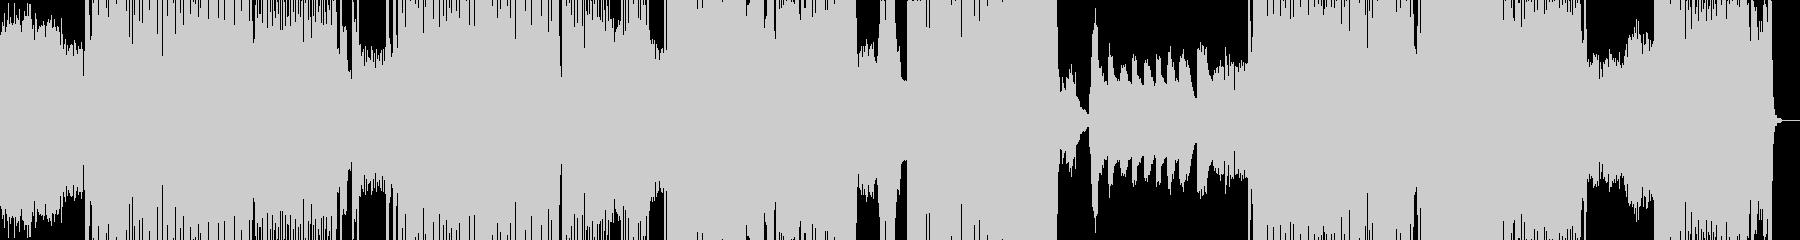 DTM ノイズトランステクノポップスの未再生の波形